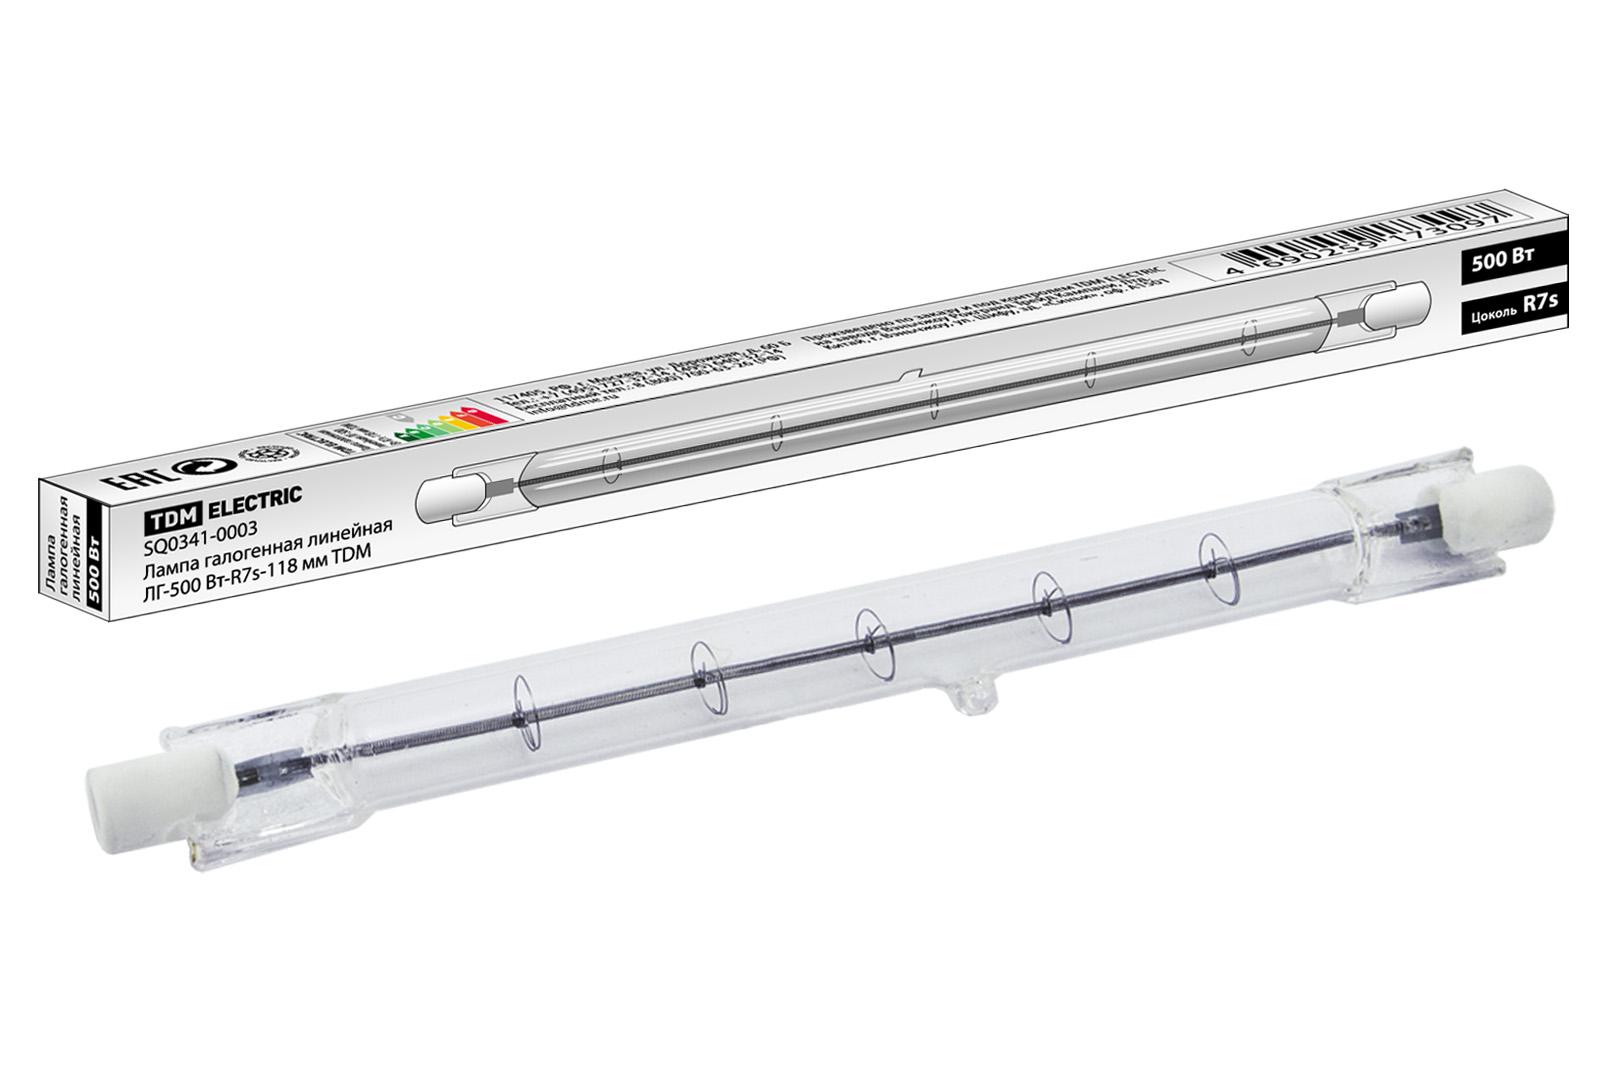 Фото Лампа галогенная линейная ЛГ-500 Вт-R7s-118 мм TDM {SQ0341-0003}